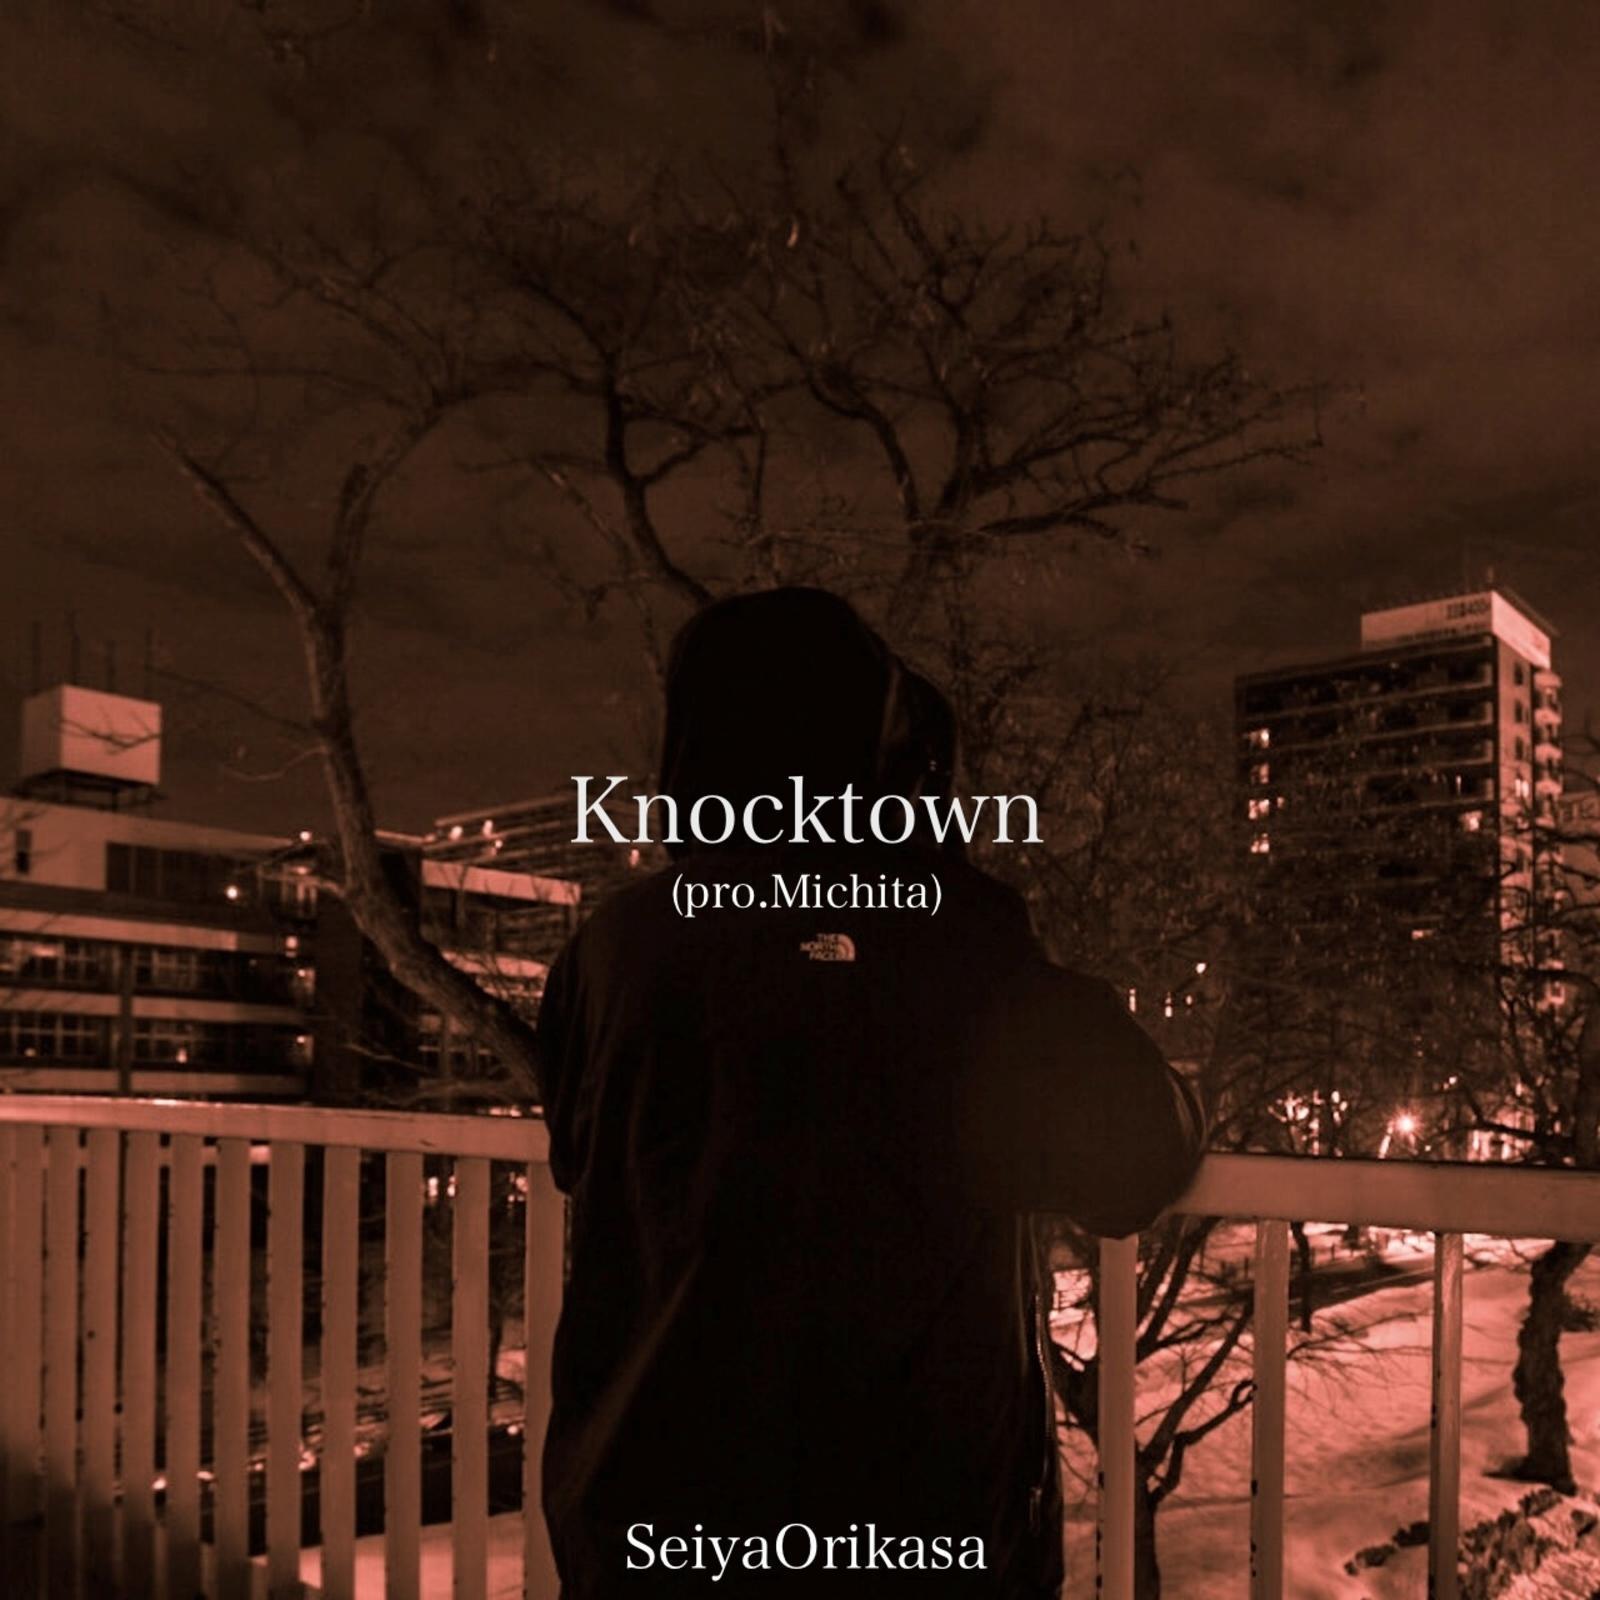 Knocktown